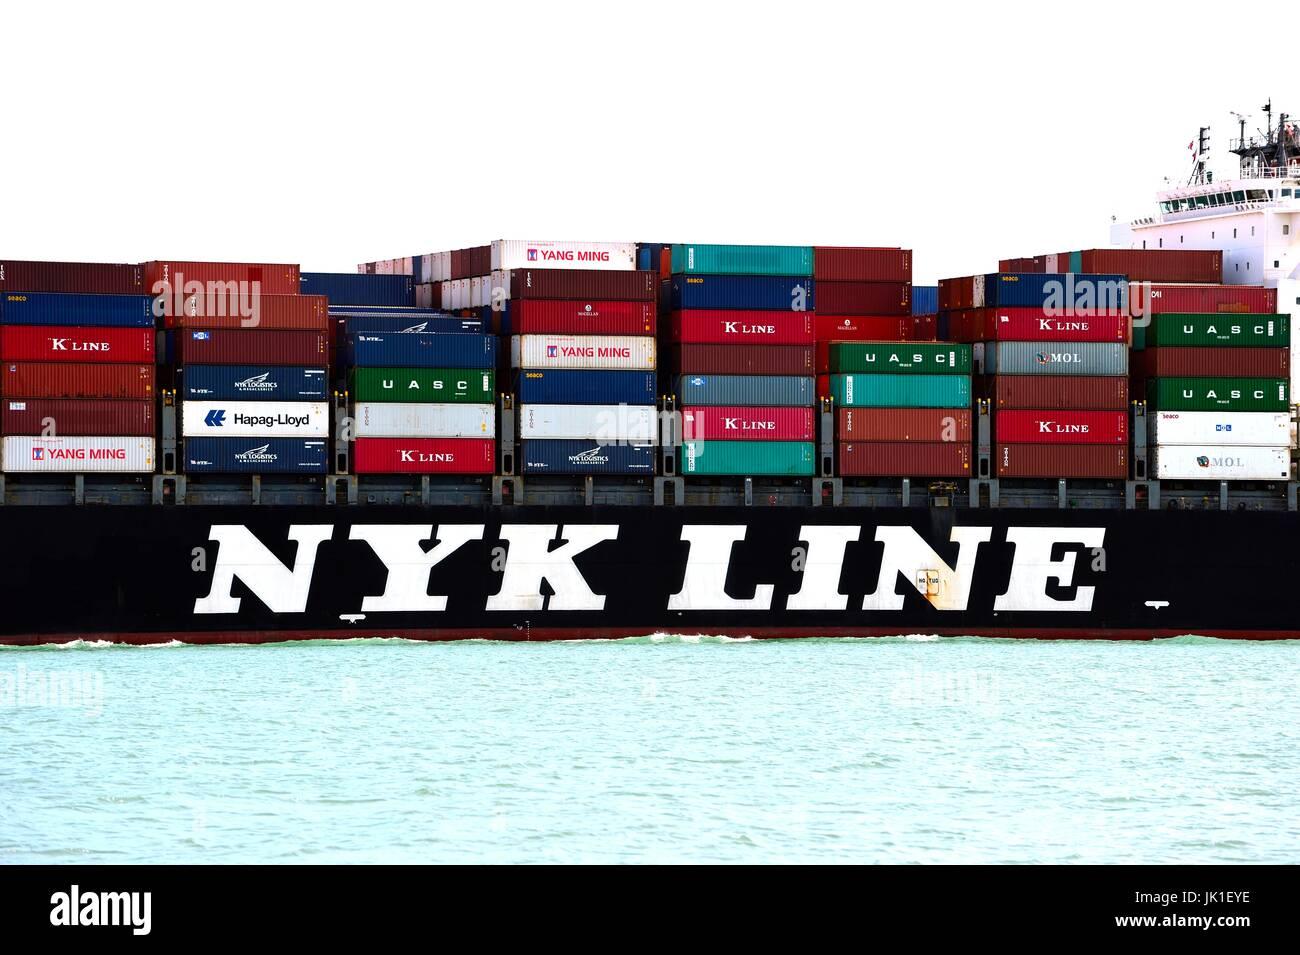 Cargo ships - Stock Image